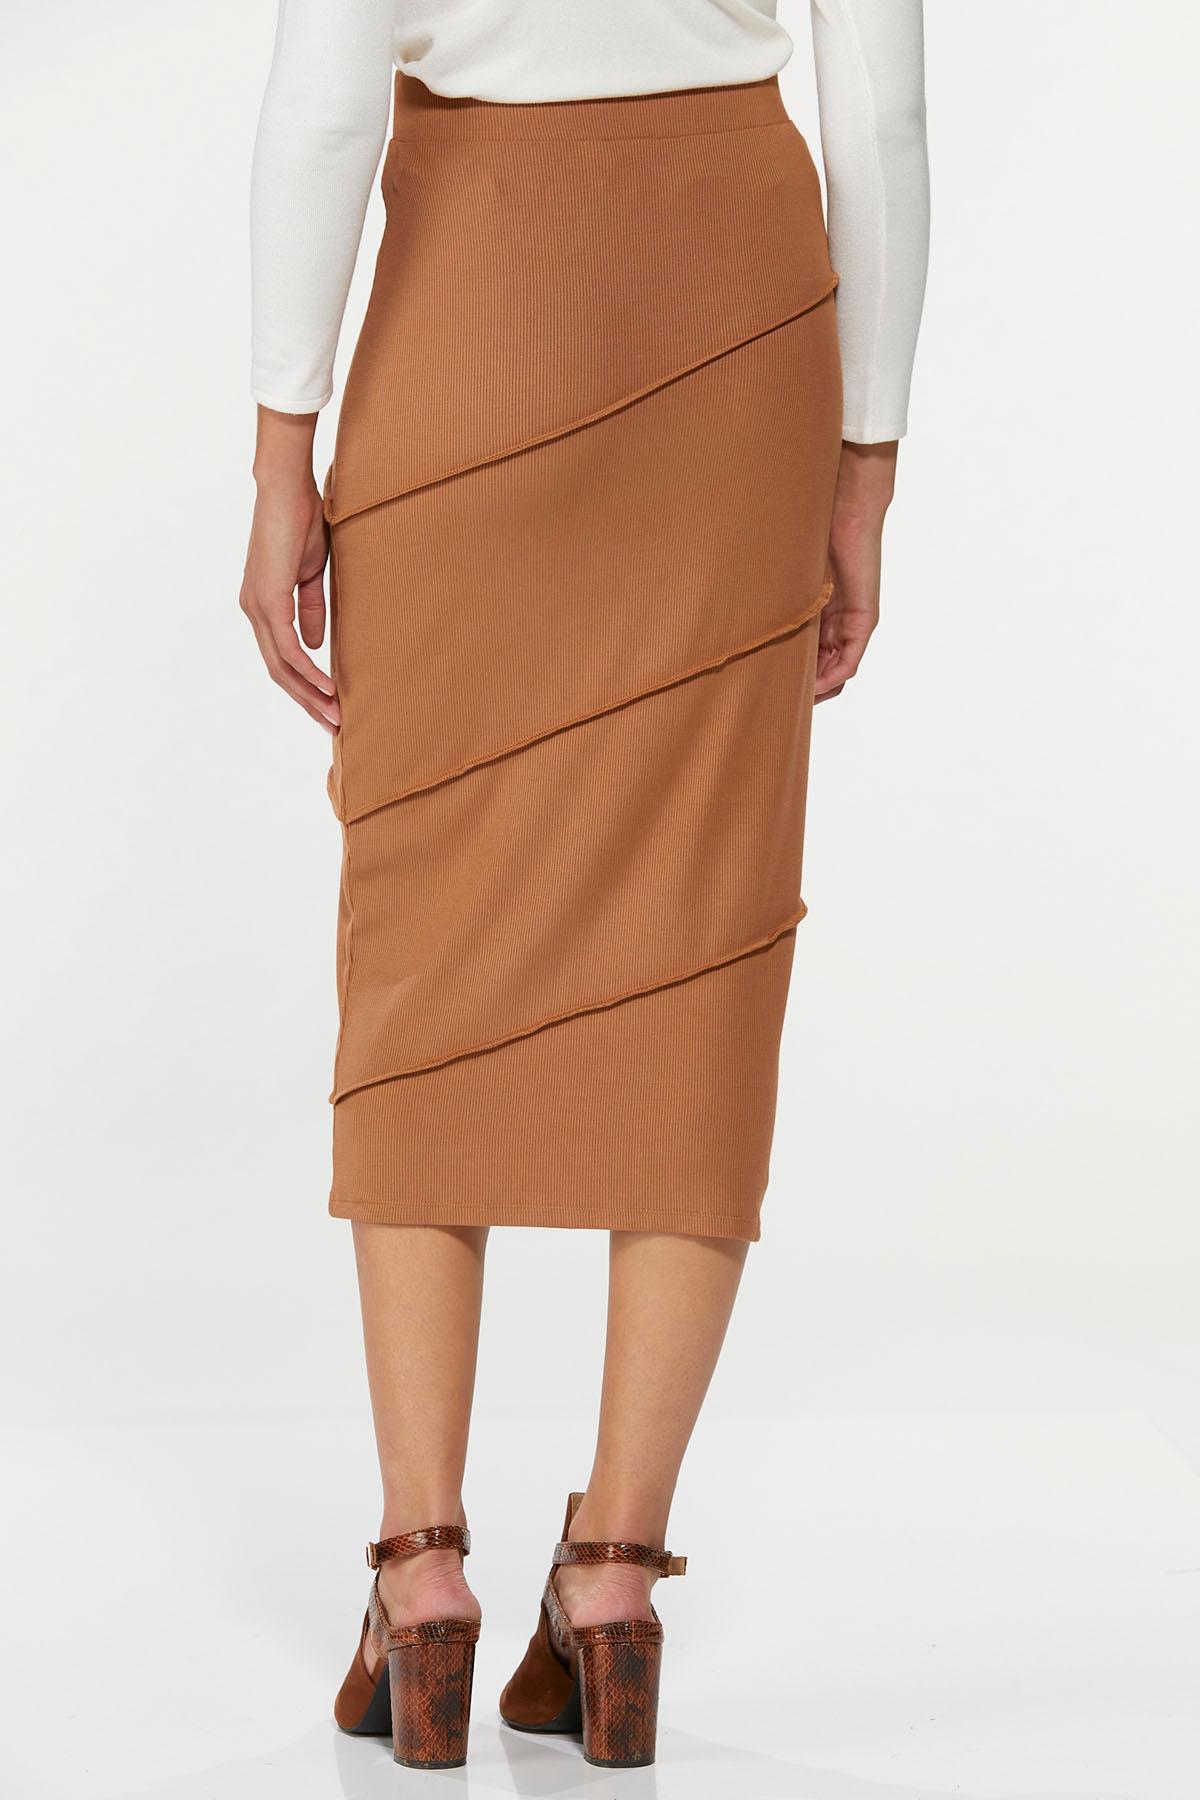 Plus Size Ribbed Pencil Skirt (Item #44671527)